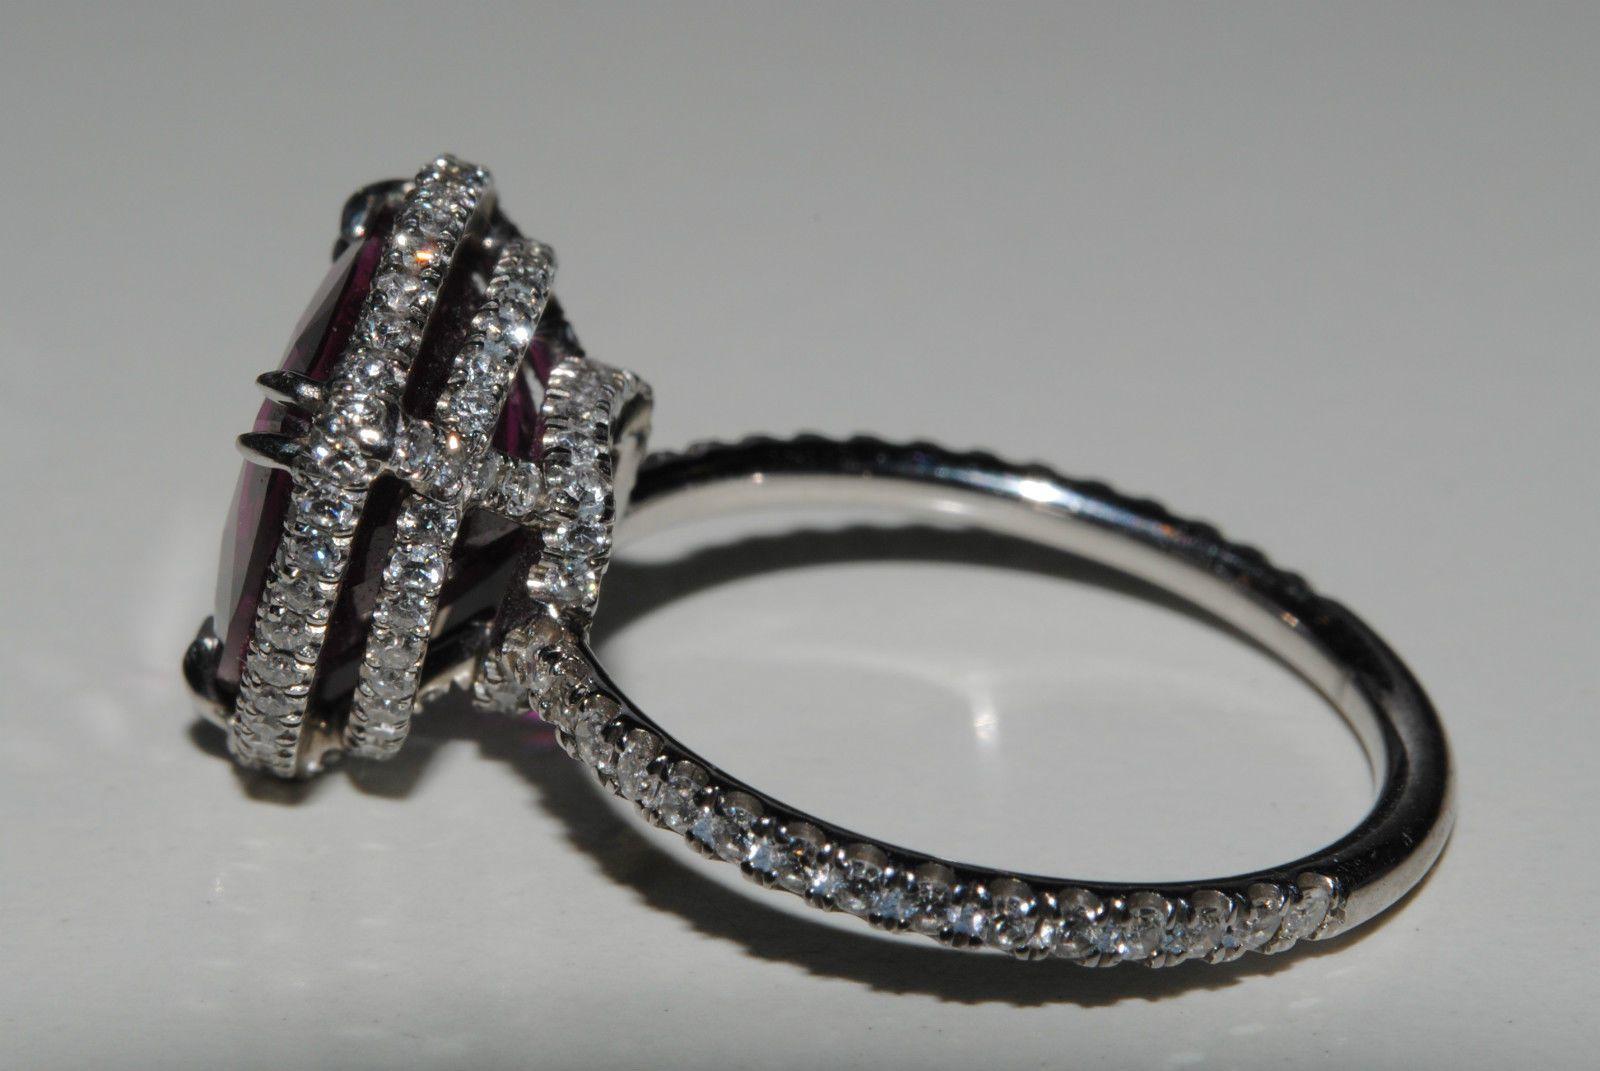 Platinum 539 Natural Triangle Ruby Designer Diamond Ring Ebay: Triangle Ruby Wedding Rings At Reisefeber.org